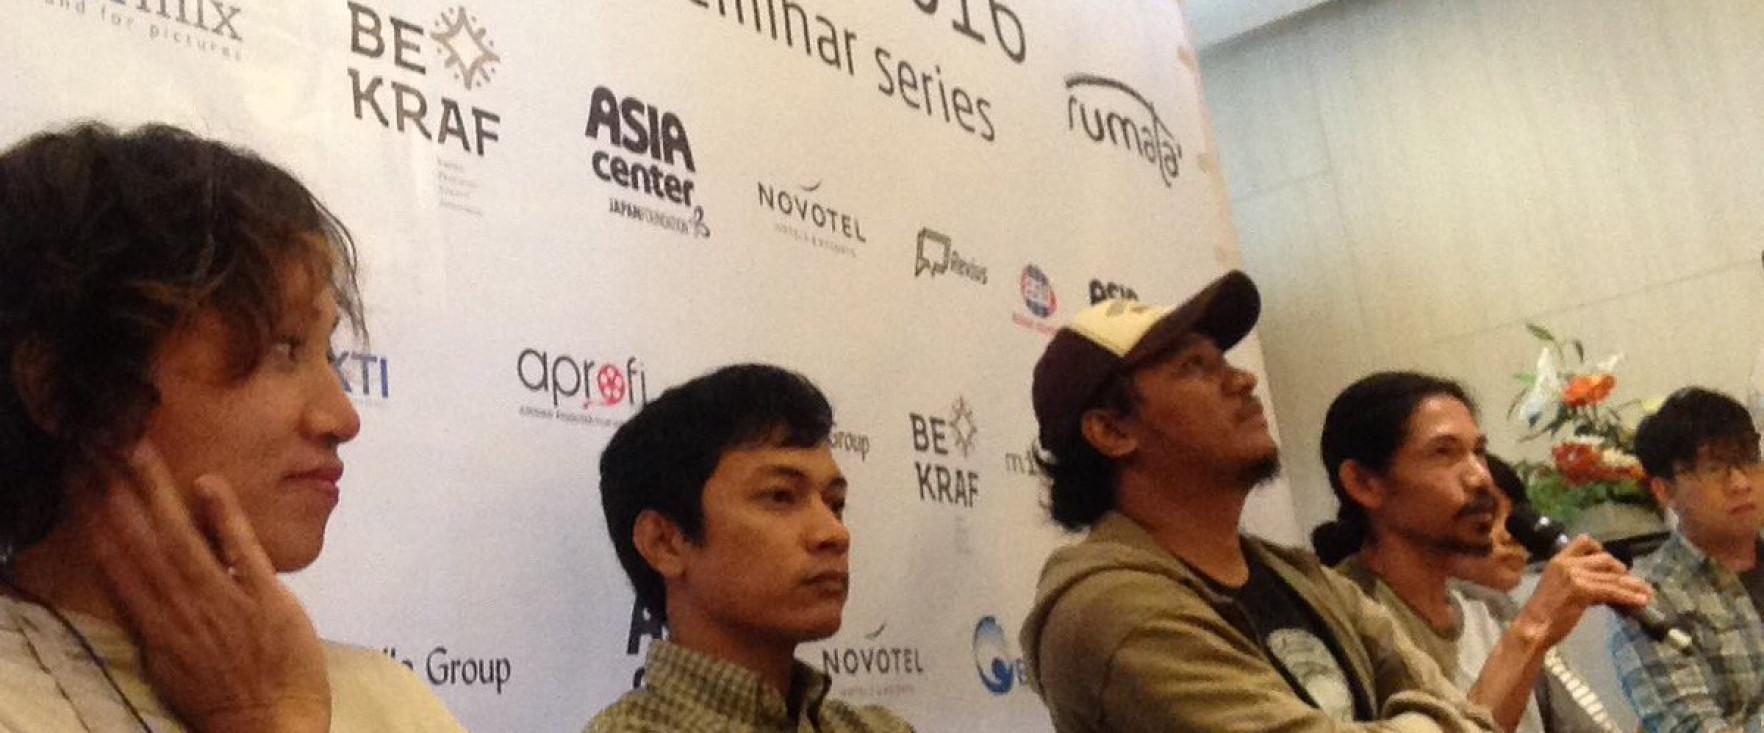 Menilik Perfilman Indonesia Berdasarkan Diskusi dengan Para Sineas Lokal Terkemuka